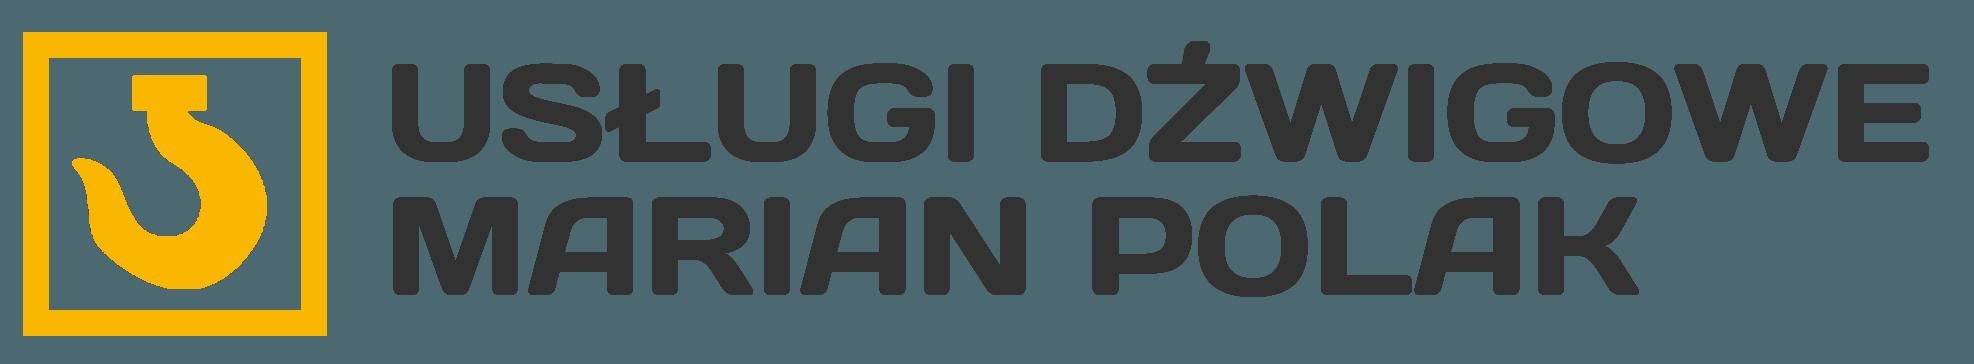 Usługi Dźwigowe Marian Polak